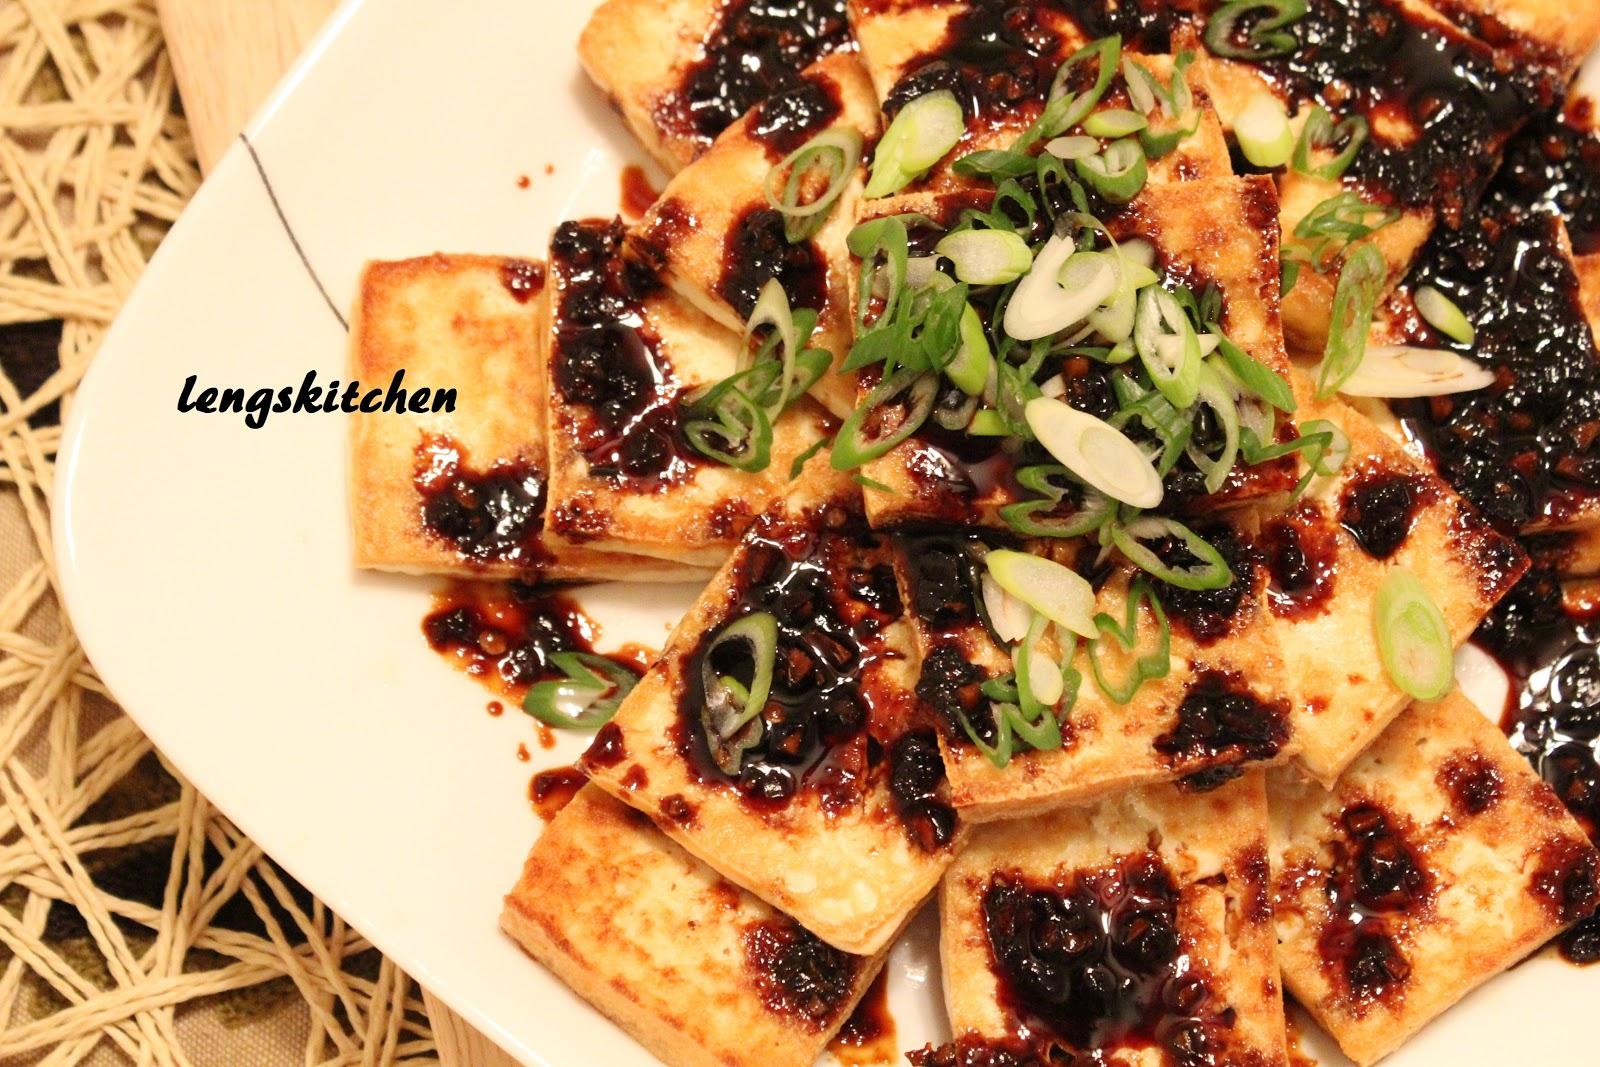 Pan Fried Tofu with Dark Sweet Soy Sauce 油煎黑酱油豆腐